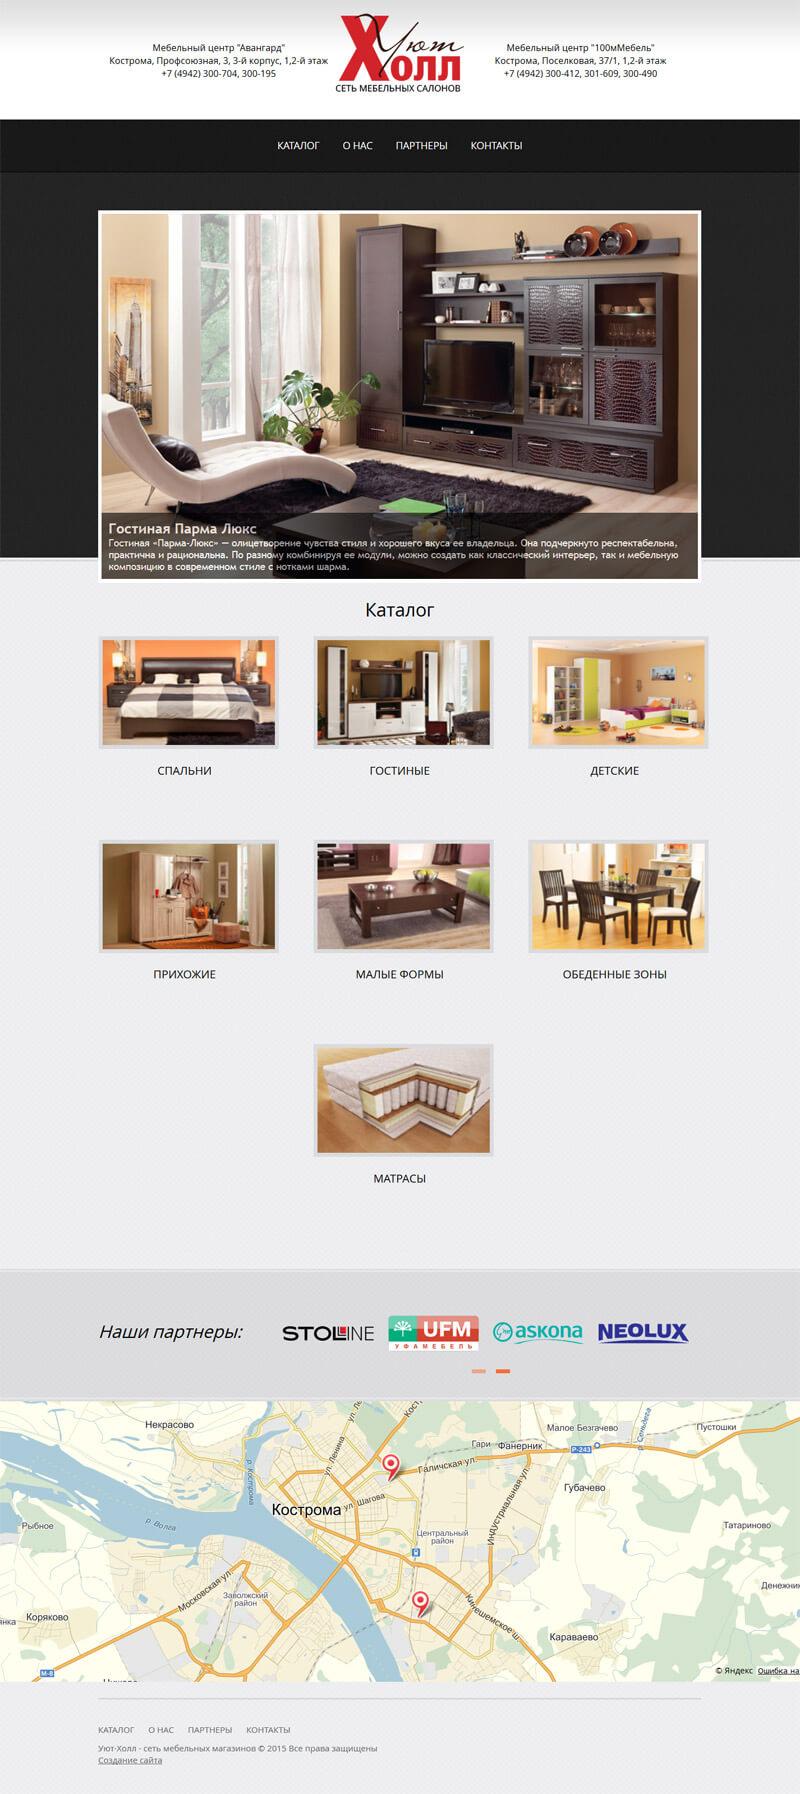 Сайт сети салонов мебели Уют Холл